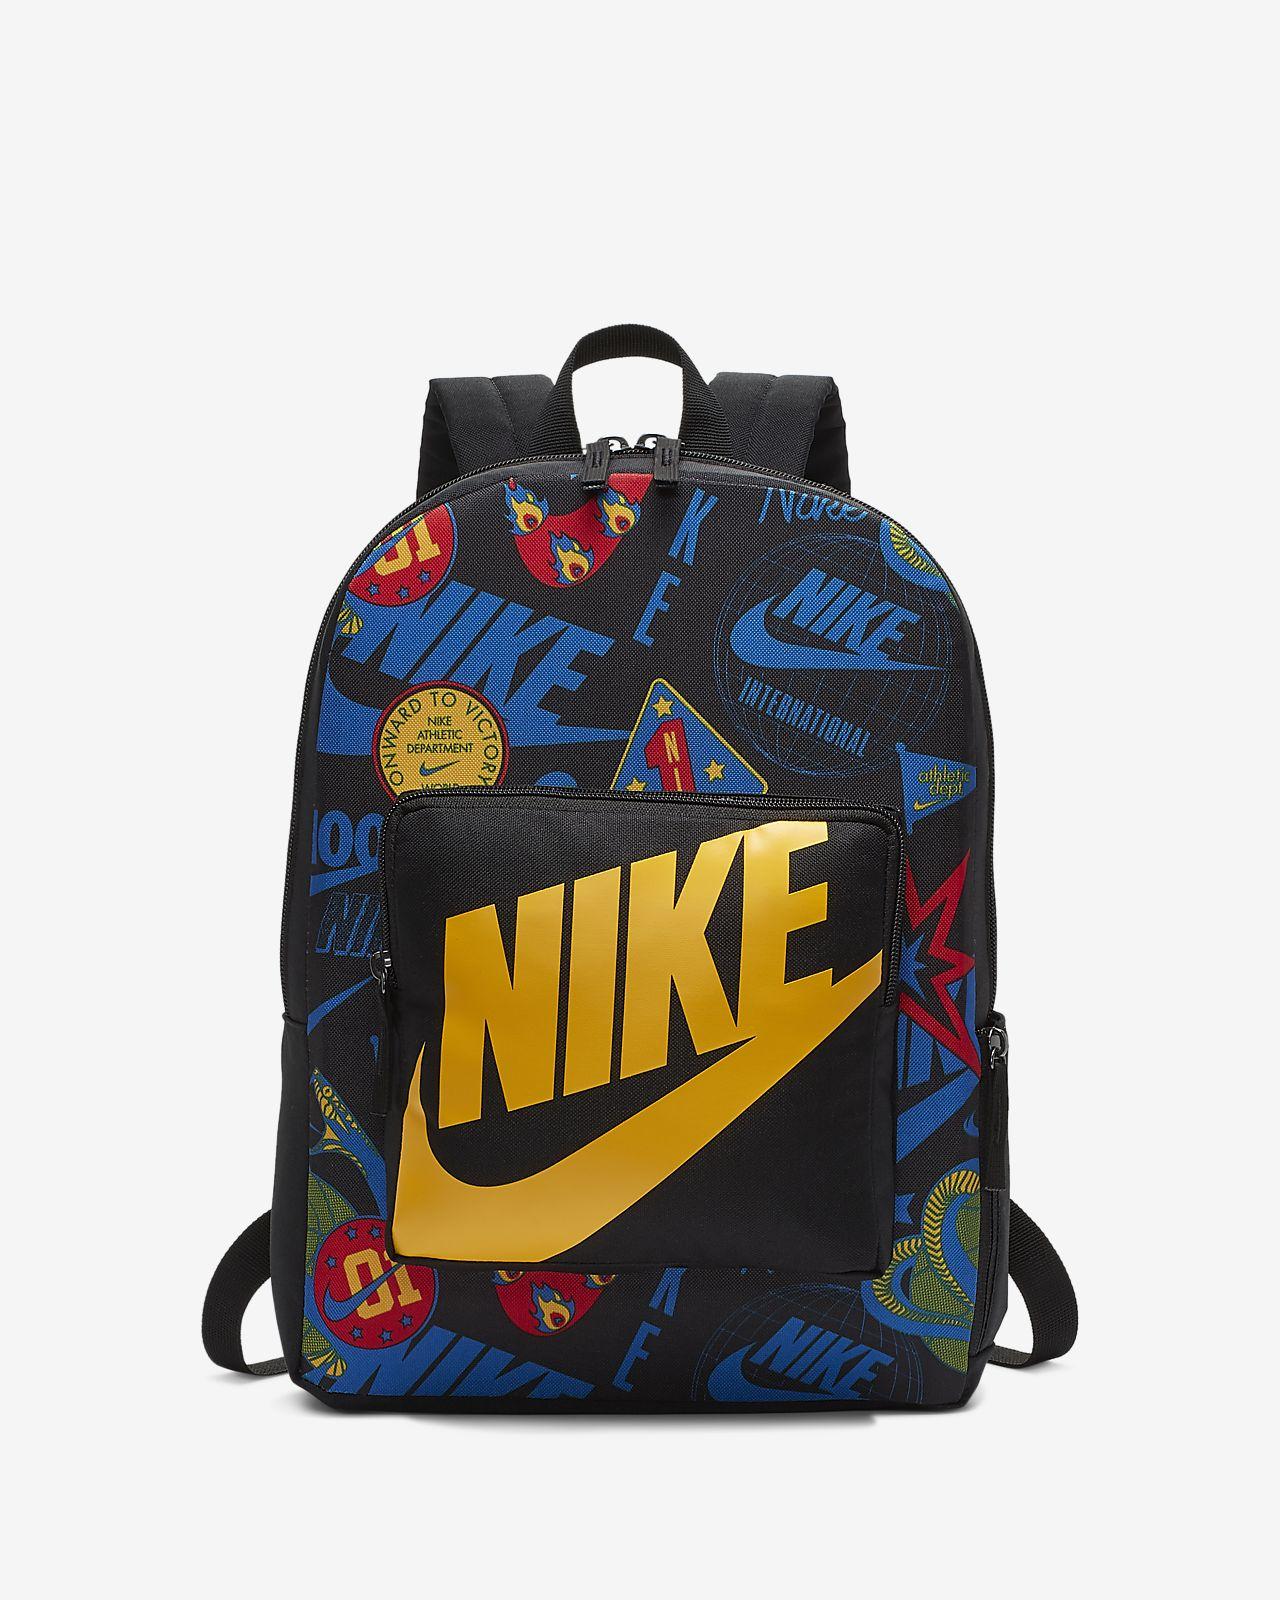 Nike Classic Rugzak met print voor kids